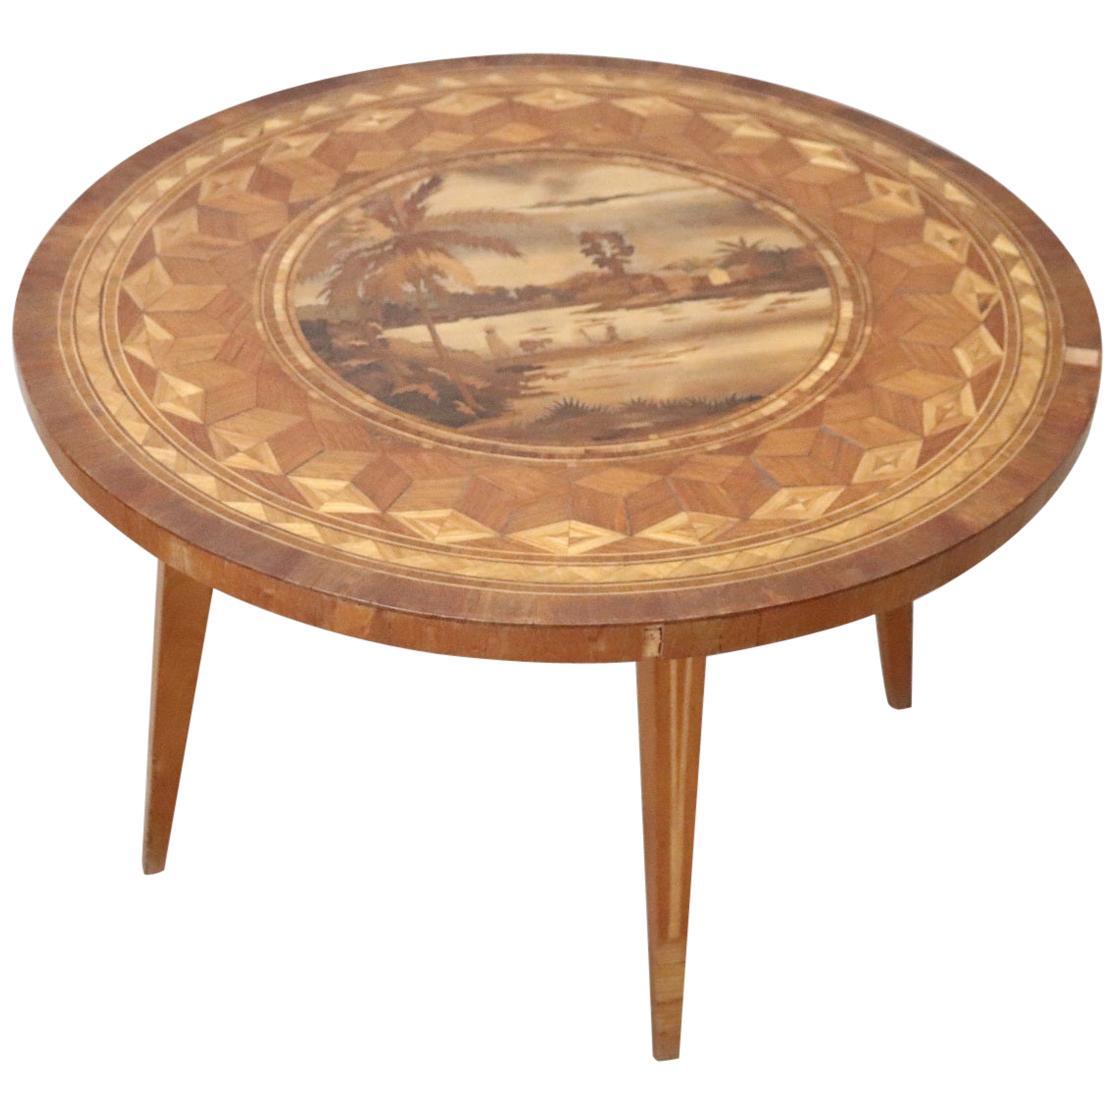 20th Century Italian Inlaid Walnut Round Coffee Table or Sofa Table